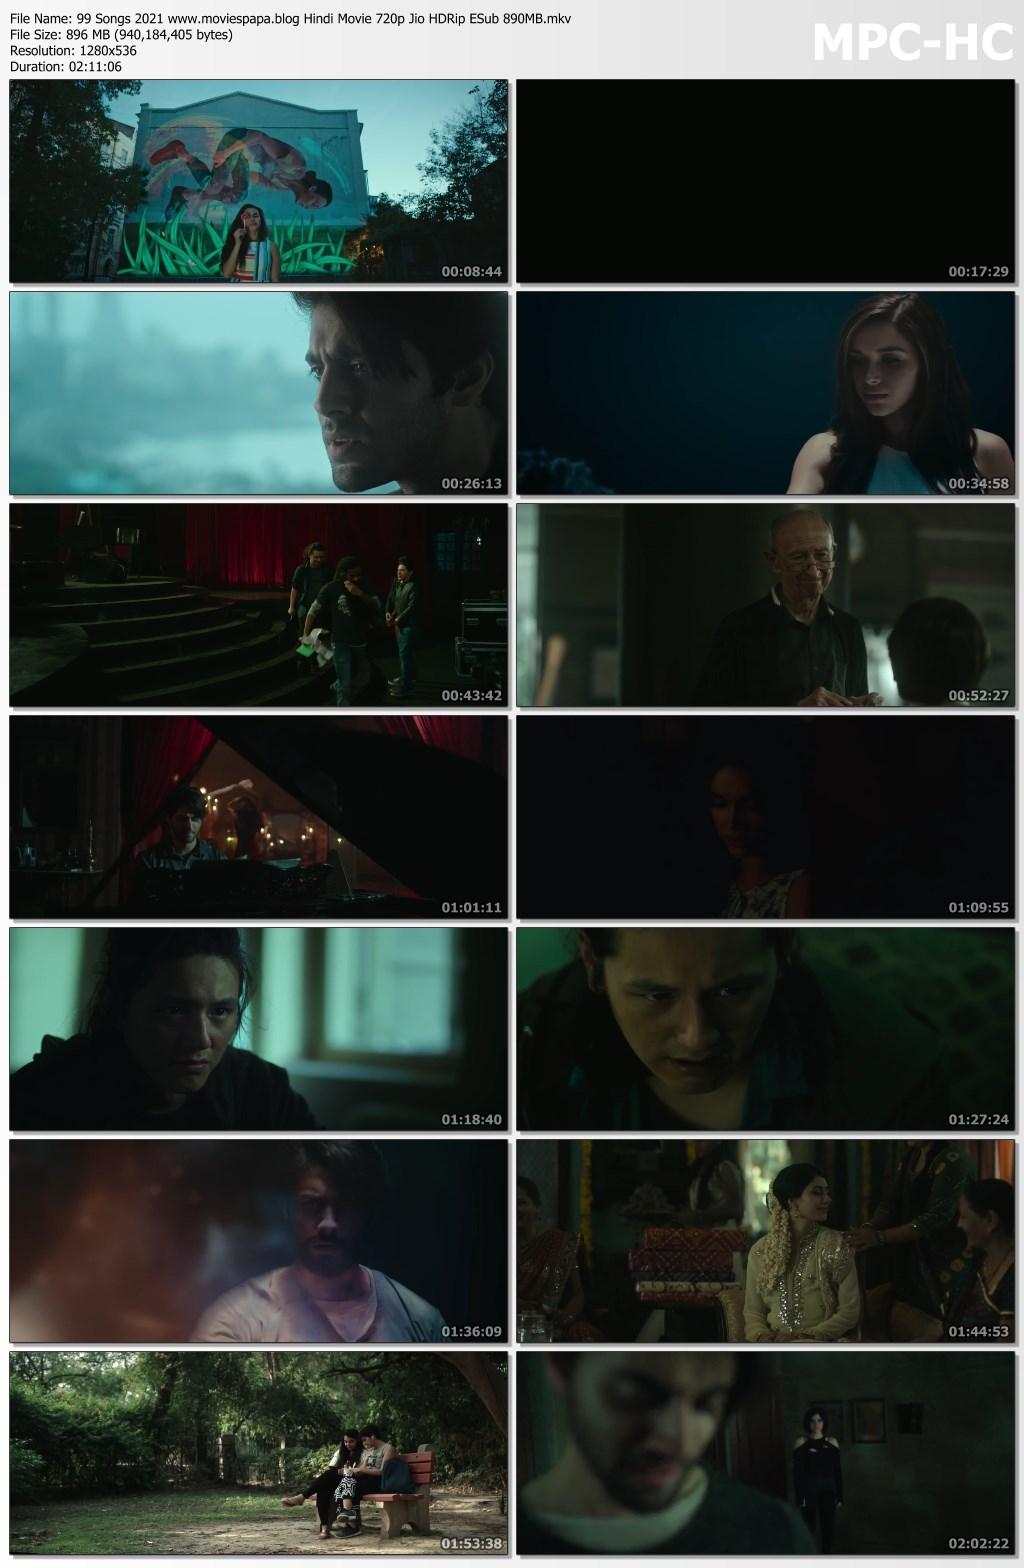 99 Songs 2021 screenshot HDMoviesFair